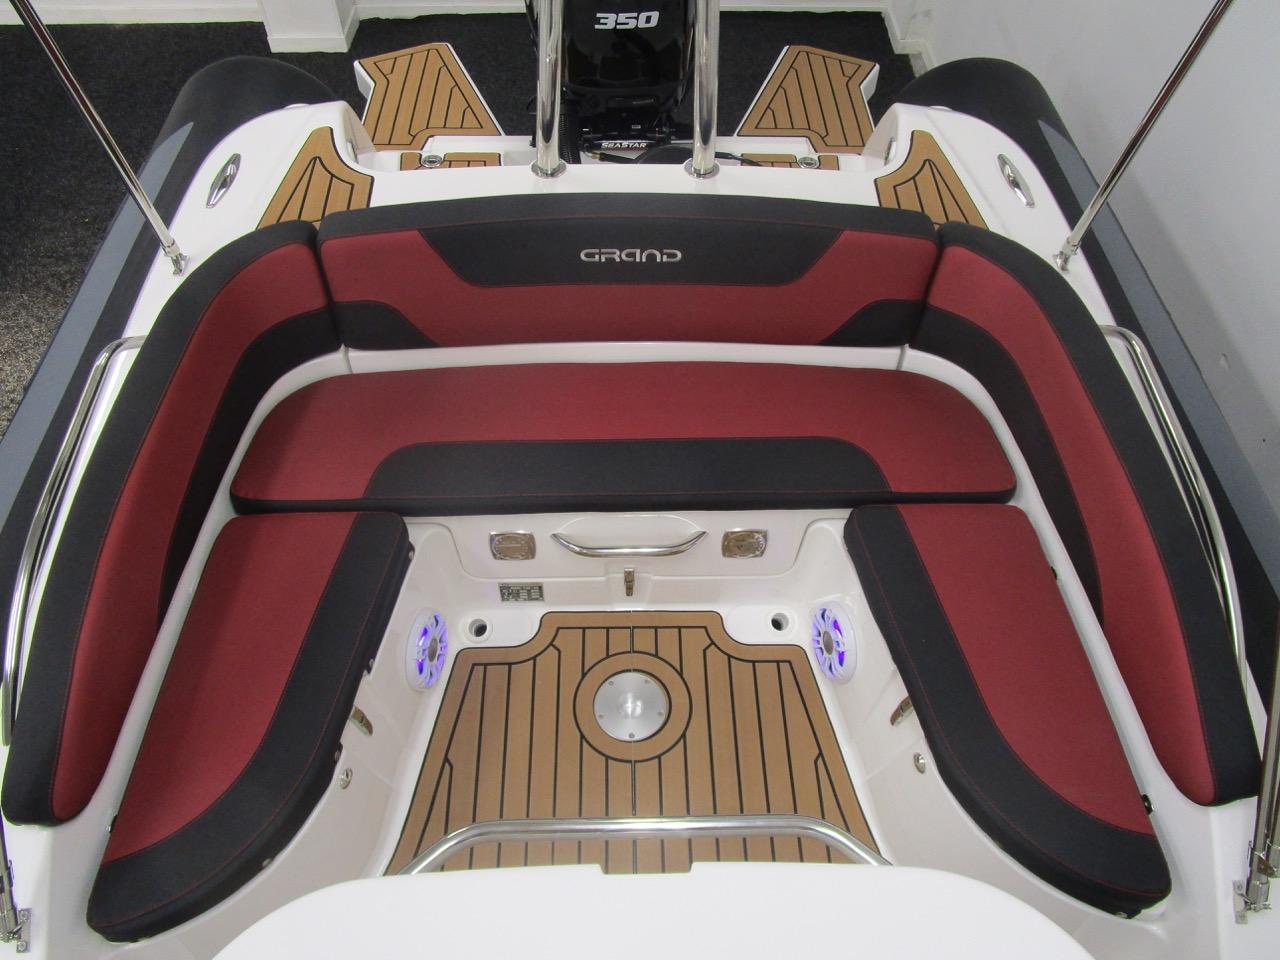 GRAND G850 RIB huge rear seat